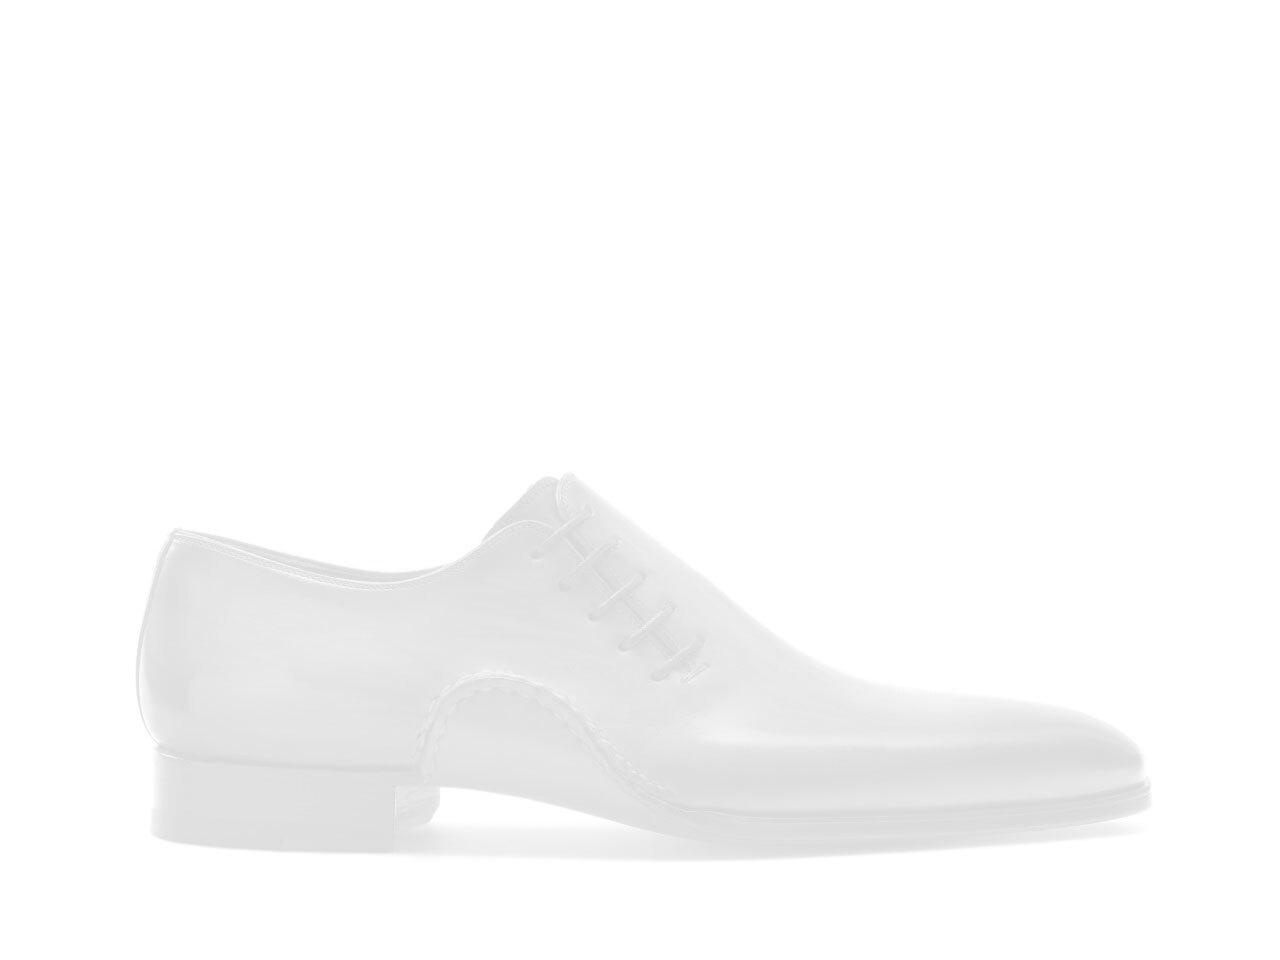 Sole of the Magnanni Ecija Grey Men's Sneakers